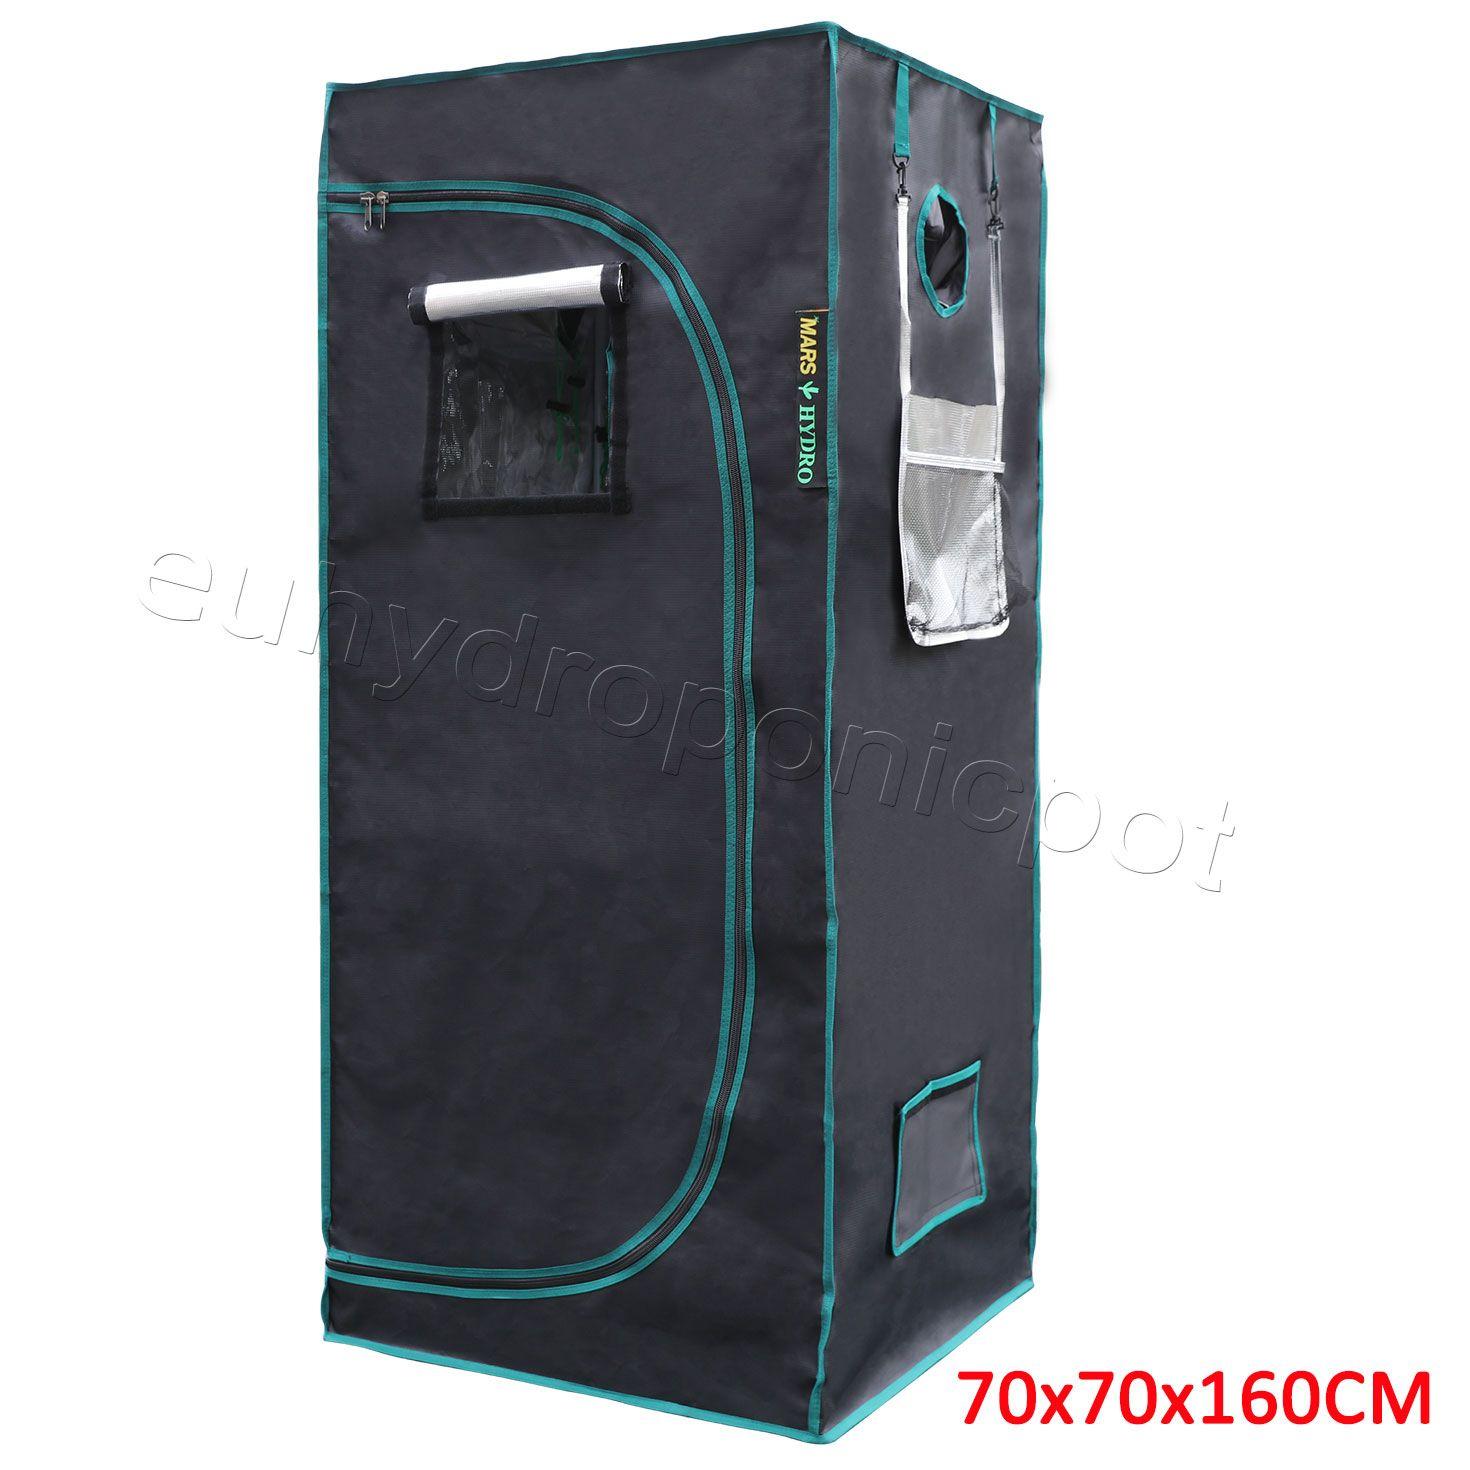 70x70x160cm Indoor Grow Tent Reflective Mylar Hydroponics Home Box Room 1680D  sc 1 st  Pinterest & 70x70x160cm Indoor Grow Tent Reflective Mylar Hydroponics Home Box ...